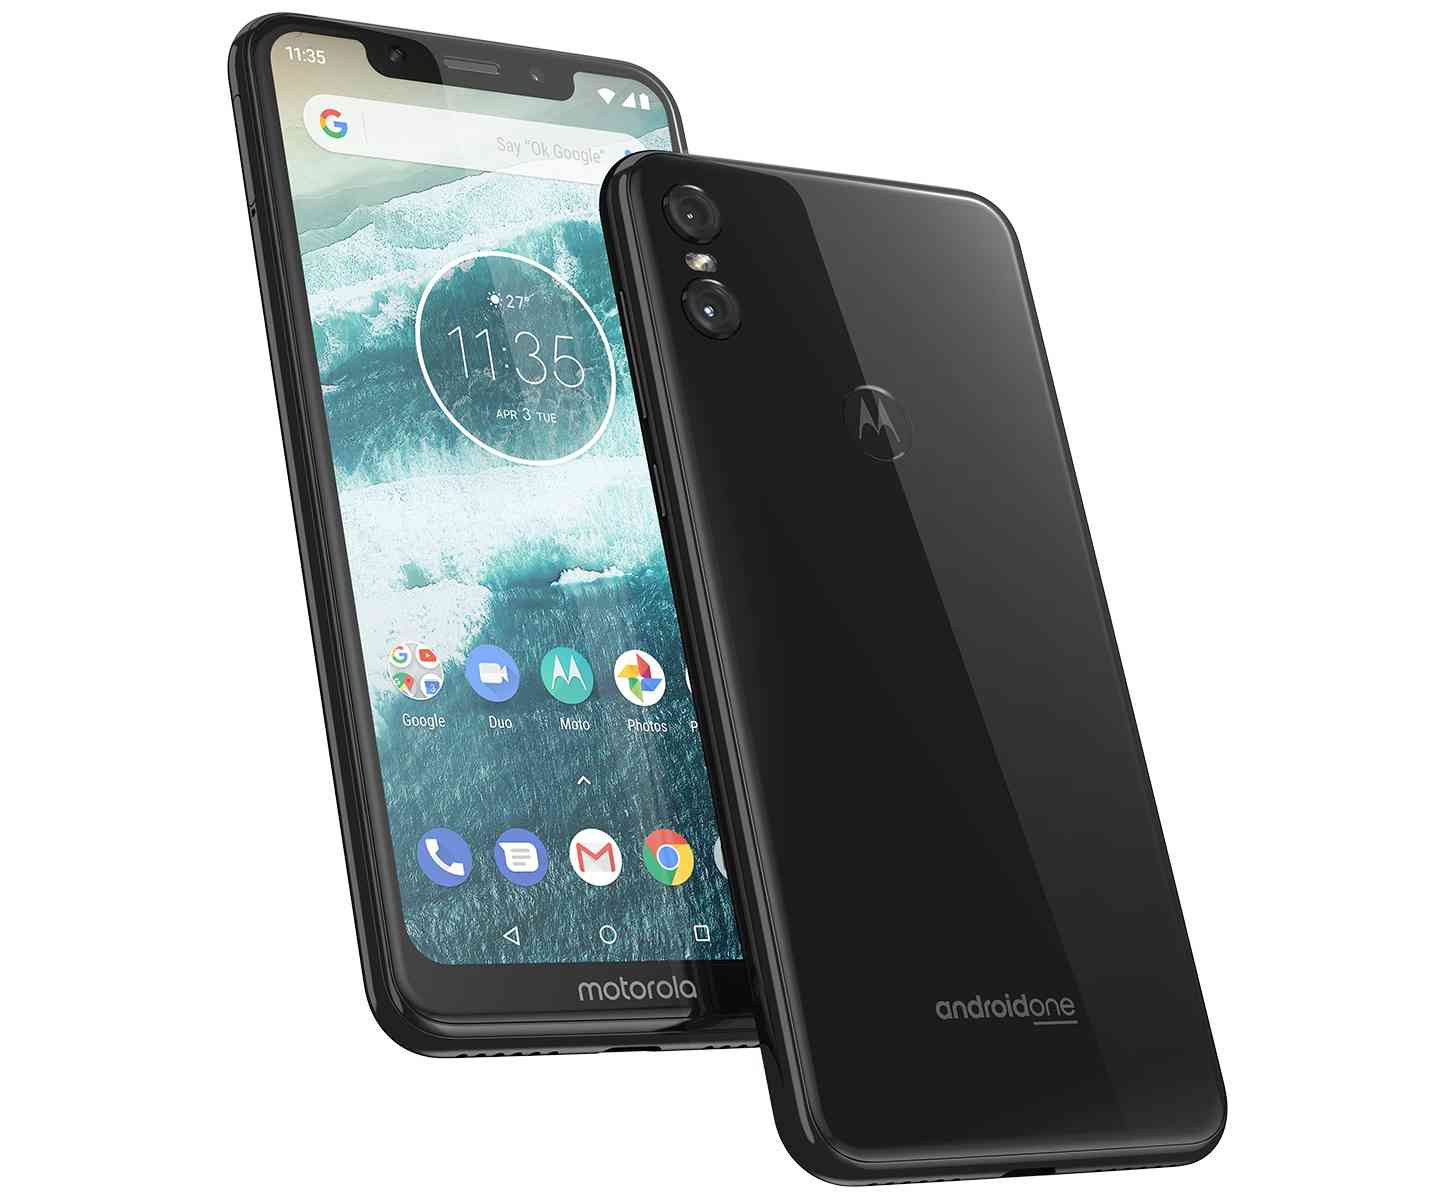 Motorola One official